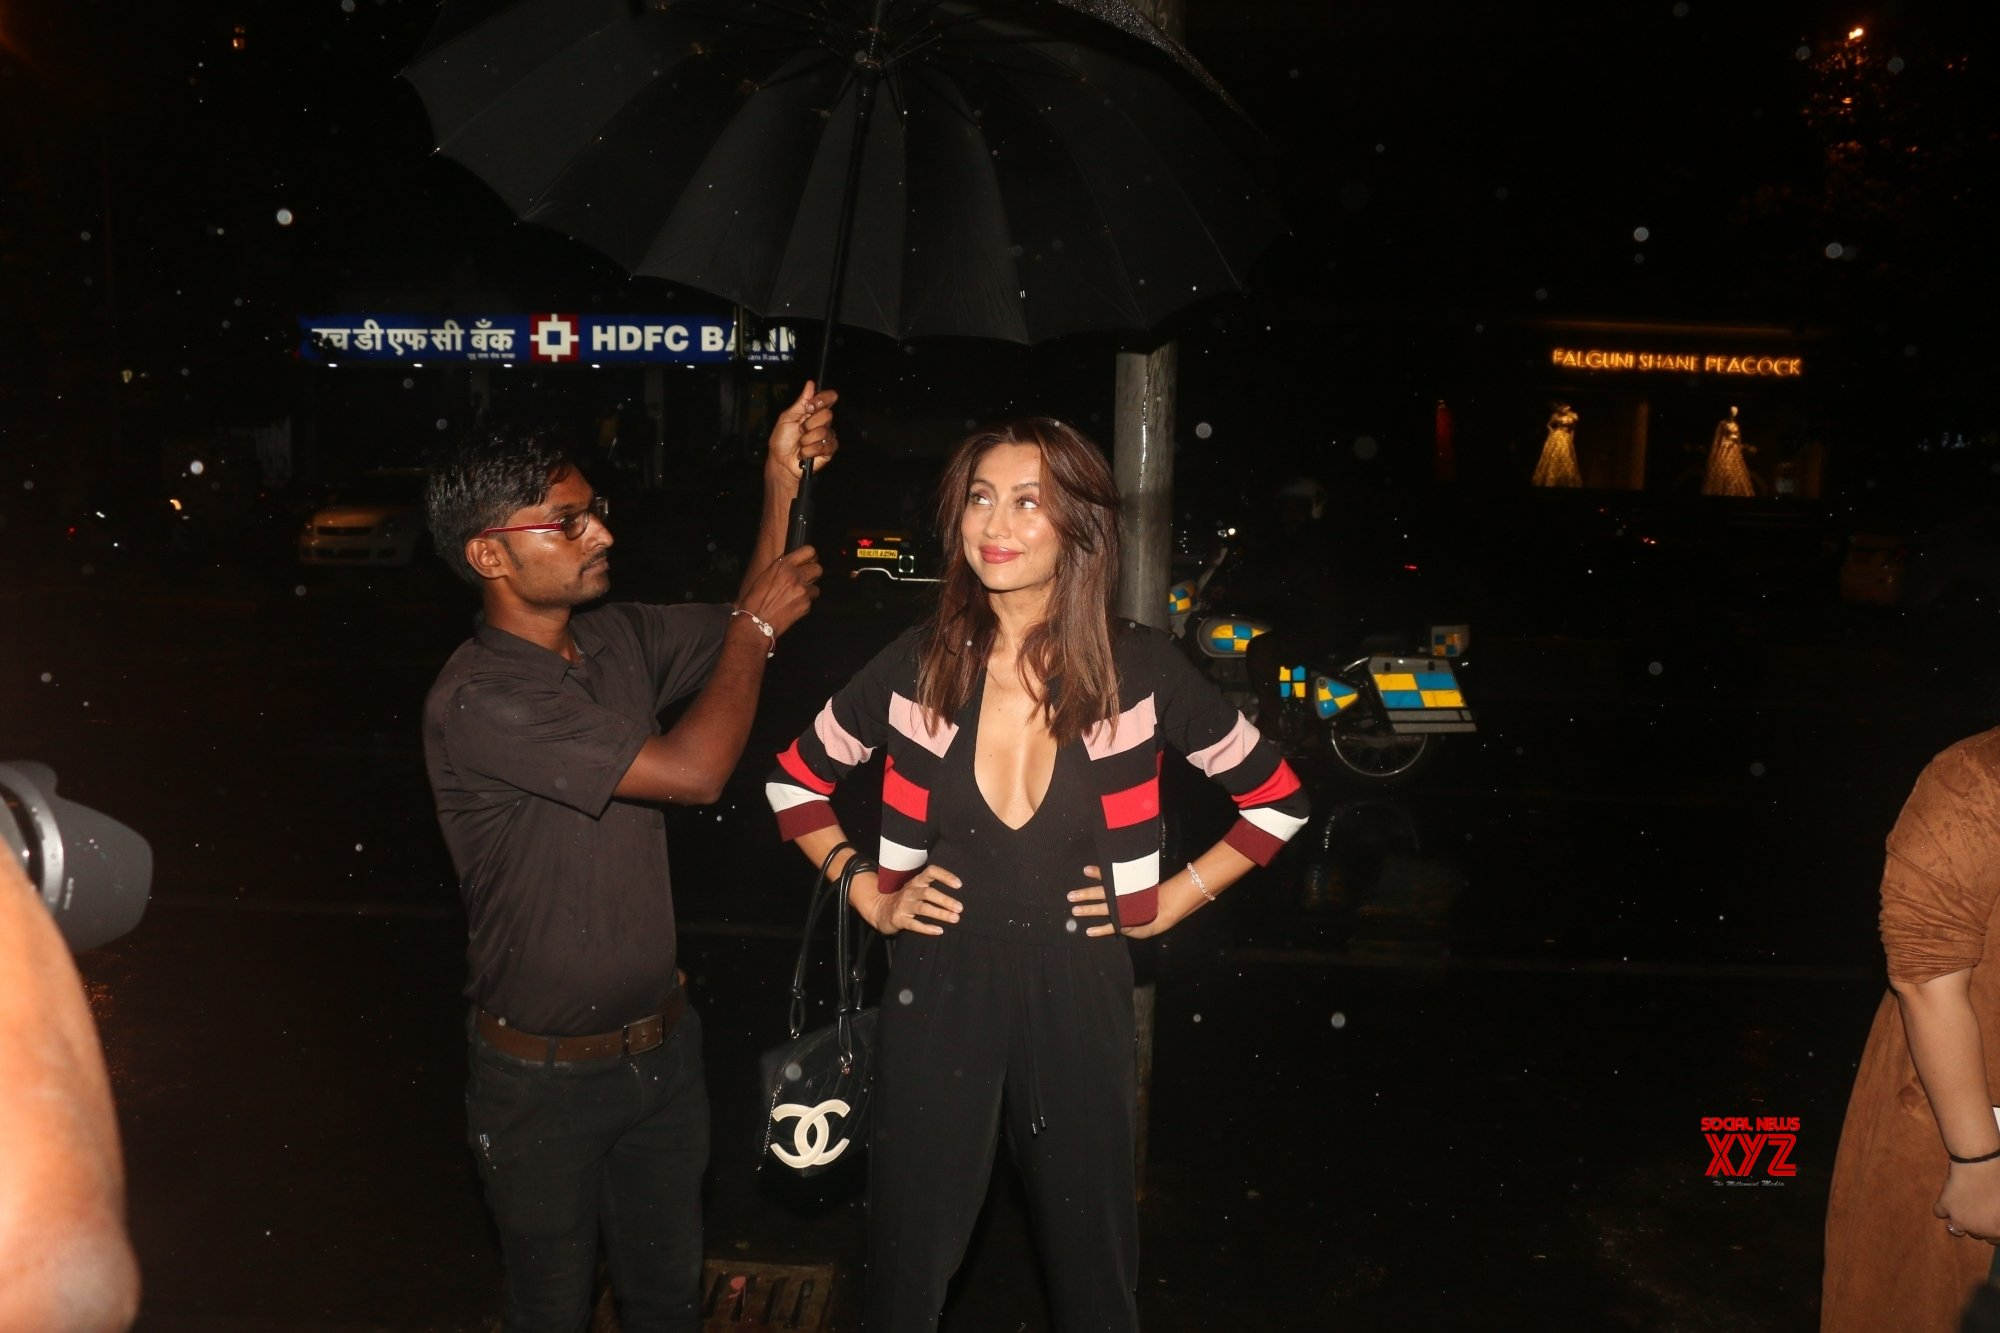 Mumbai: Anusha Dandekar at #FindThemOnBumble campaign launch #Gallery